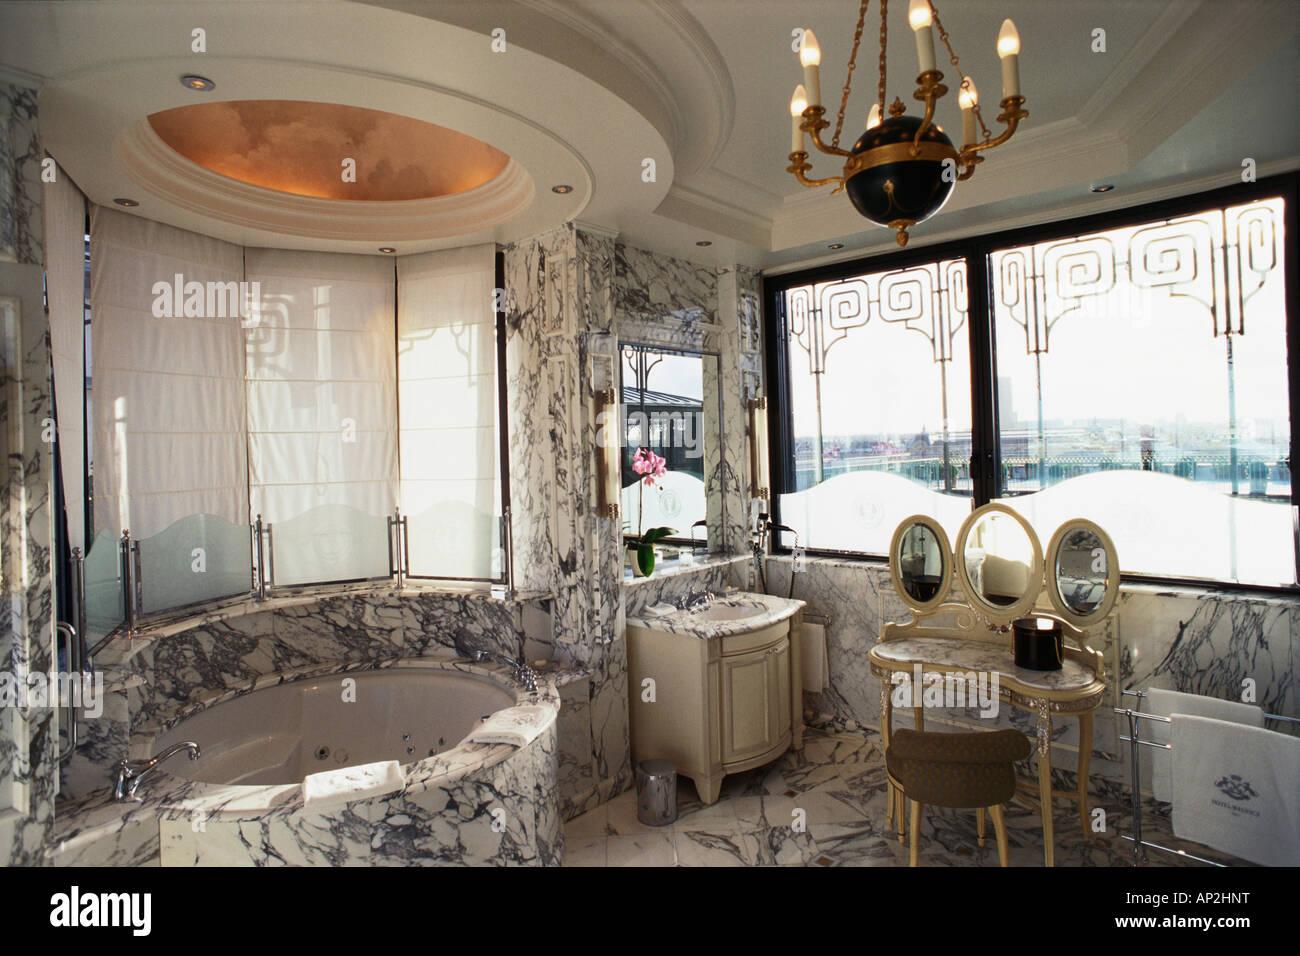 Marble Bathroom Suite And Jacuzzi Bath In La Belle Etoile Luxury Hotel Le Meurice Accomodation Paris France